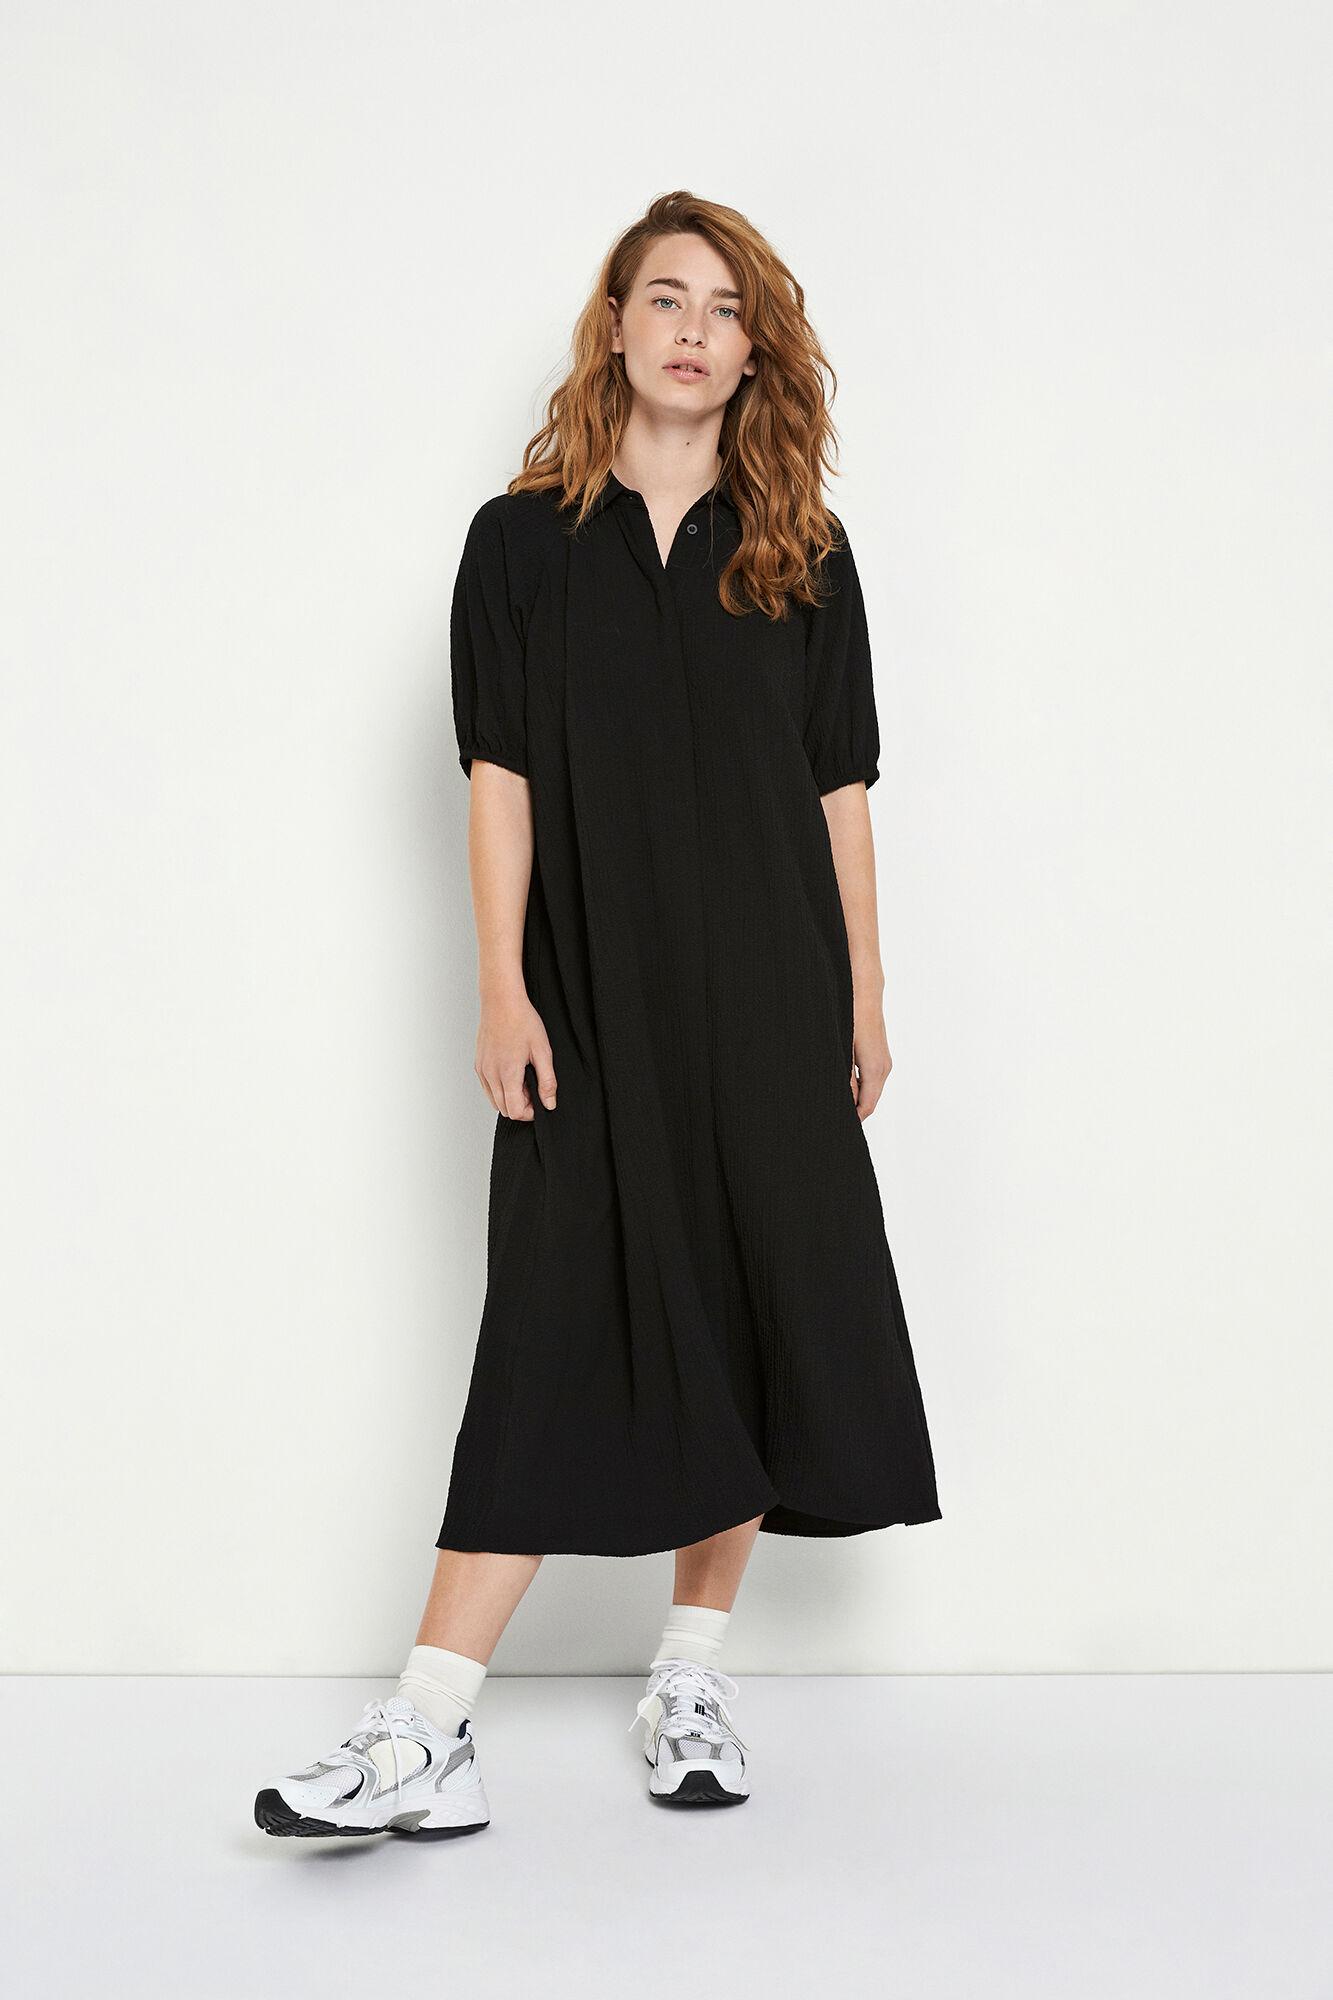 ENRAY SS DRESS 6737